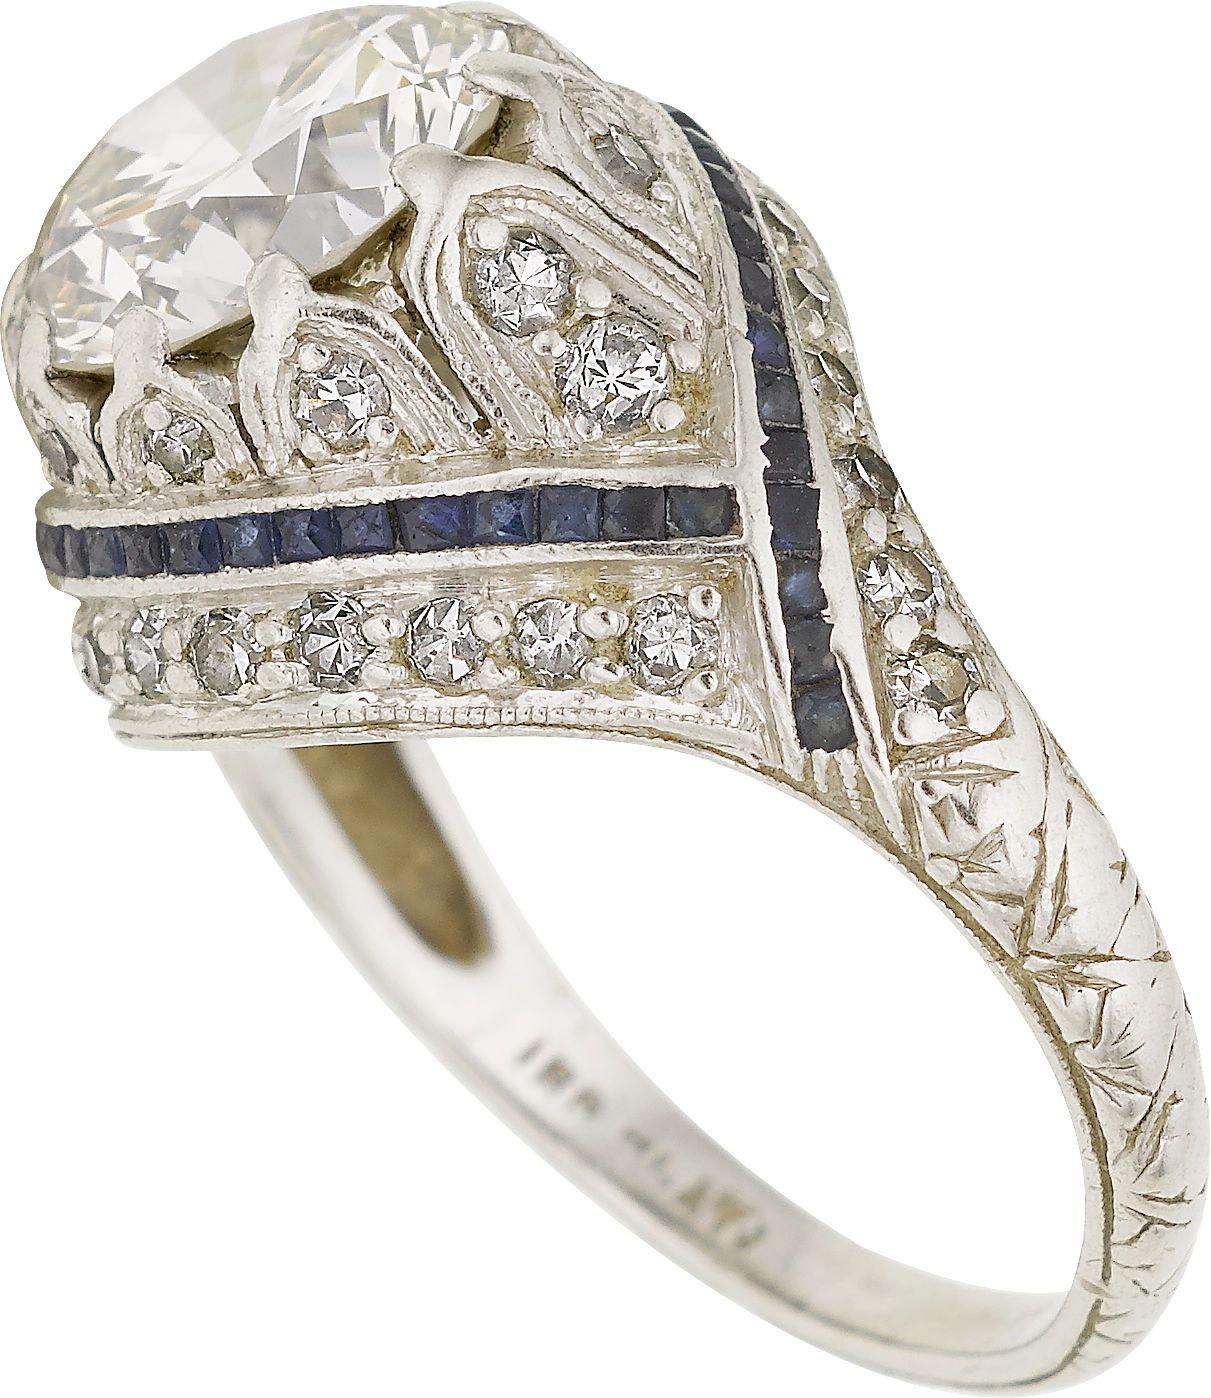 Art Deco Diamond, Sapphire, Platinum Ring. ... Estate JewelryRings | Lot #58150 | Heritage Auctions